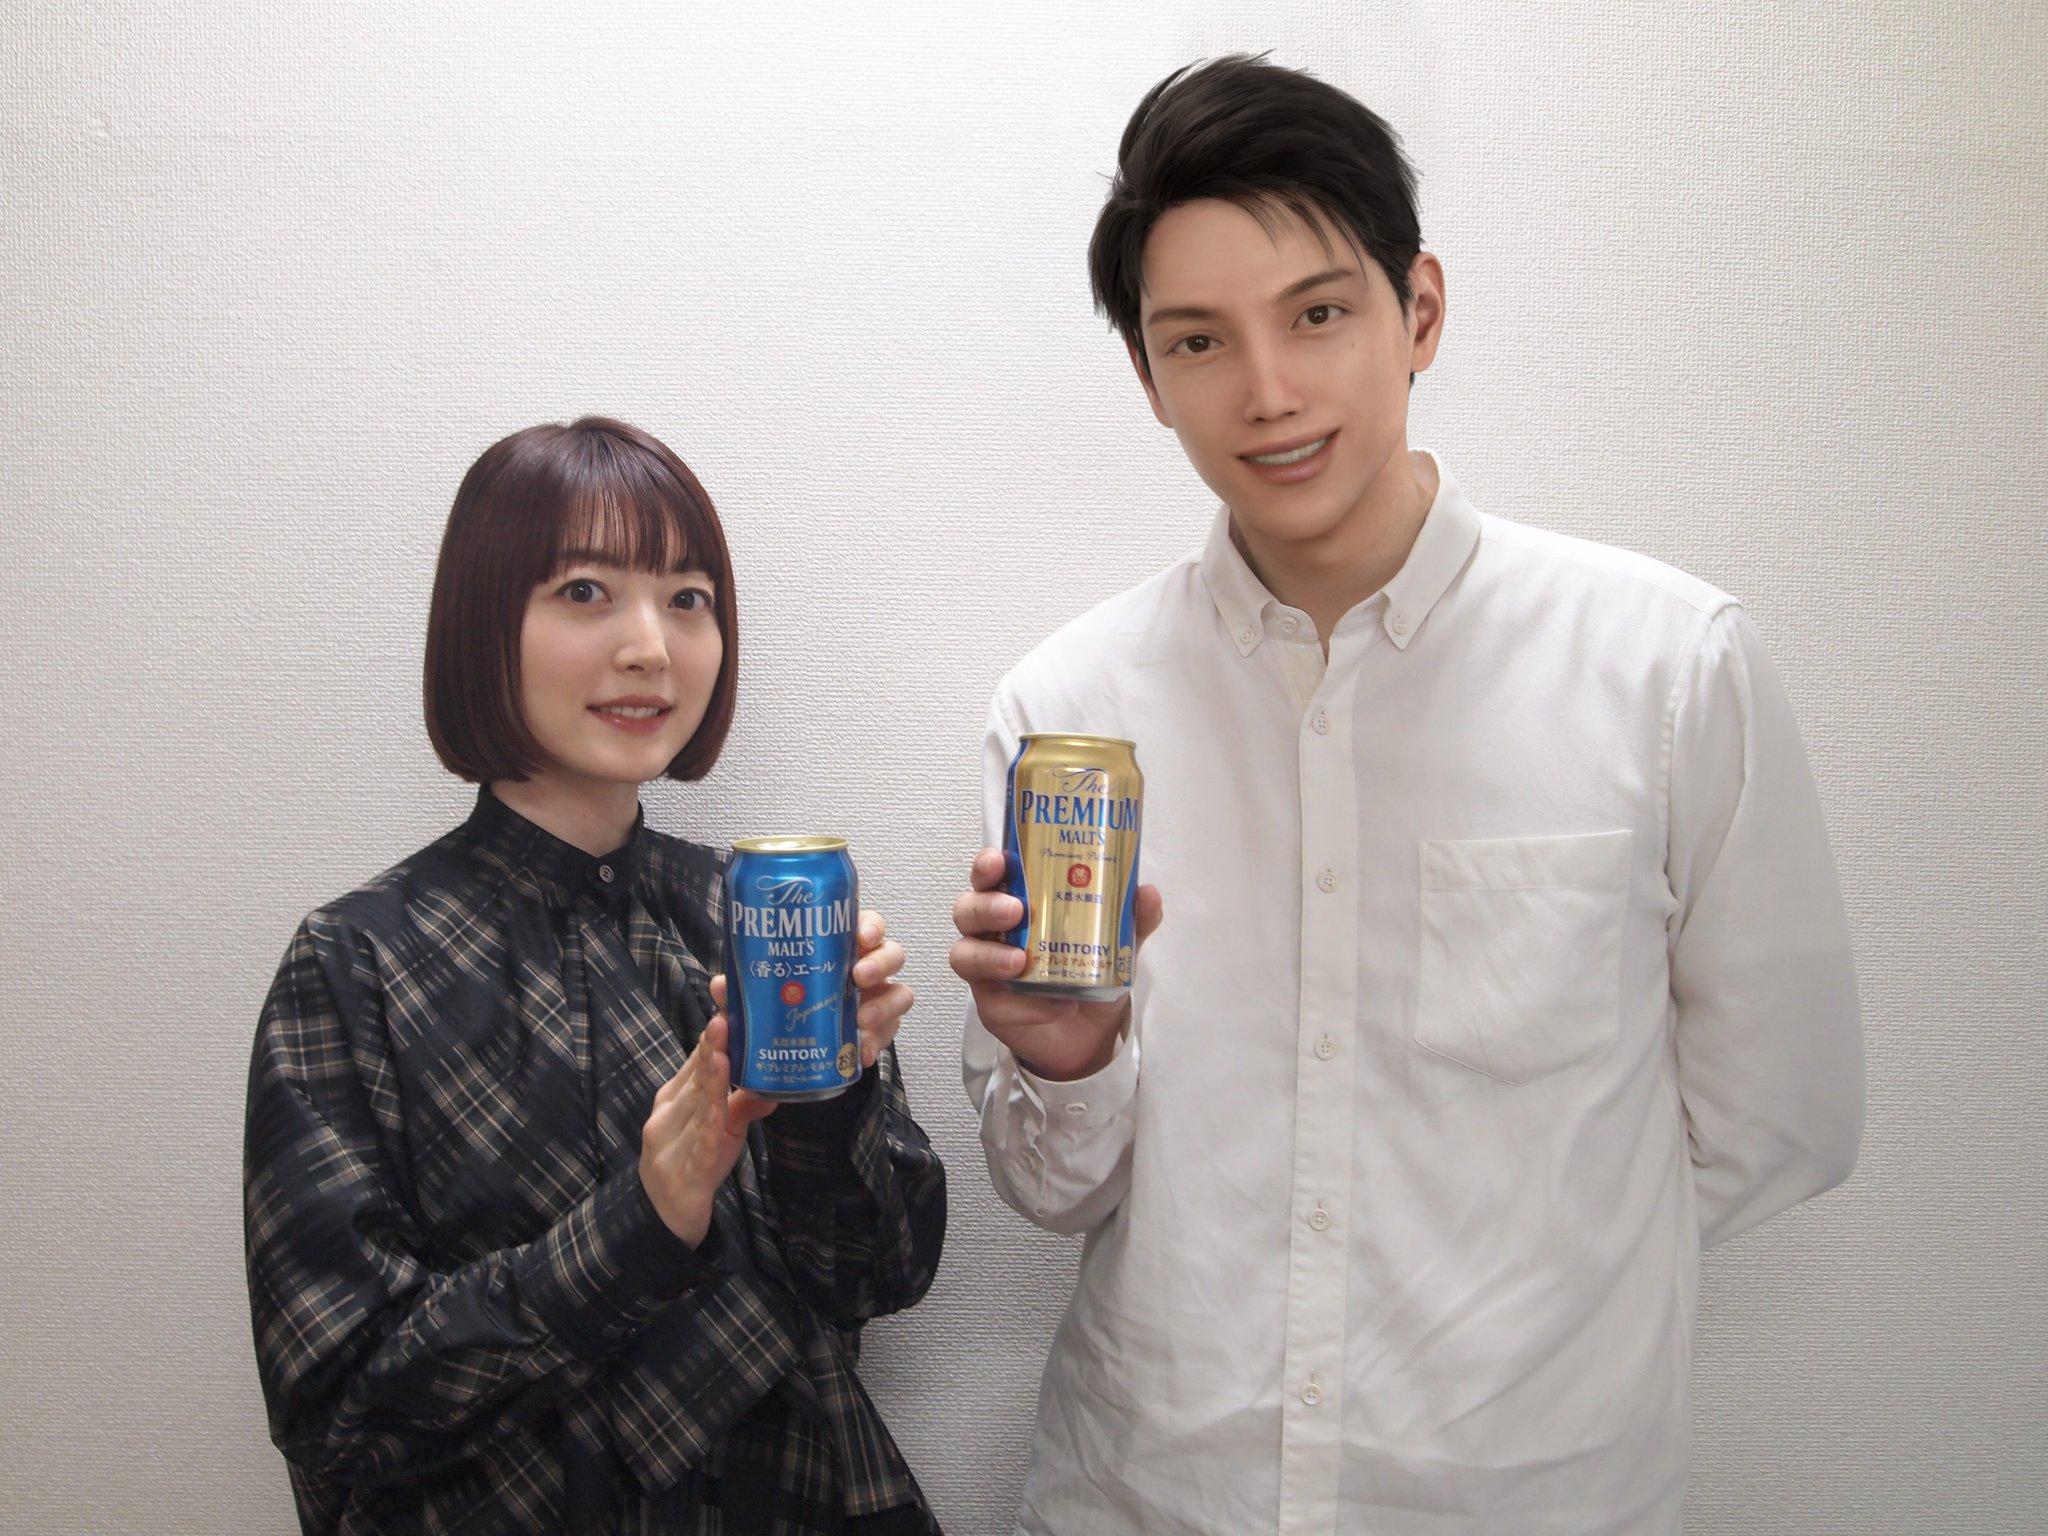 Kana Hanazawa and Mizuki Yamatori SUNTORY CGI Influencer